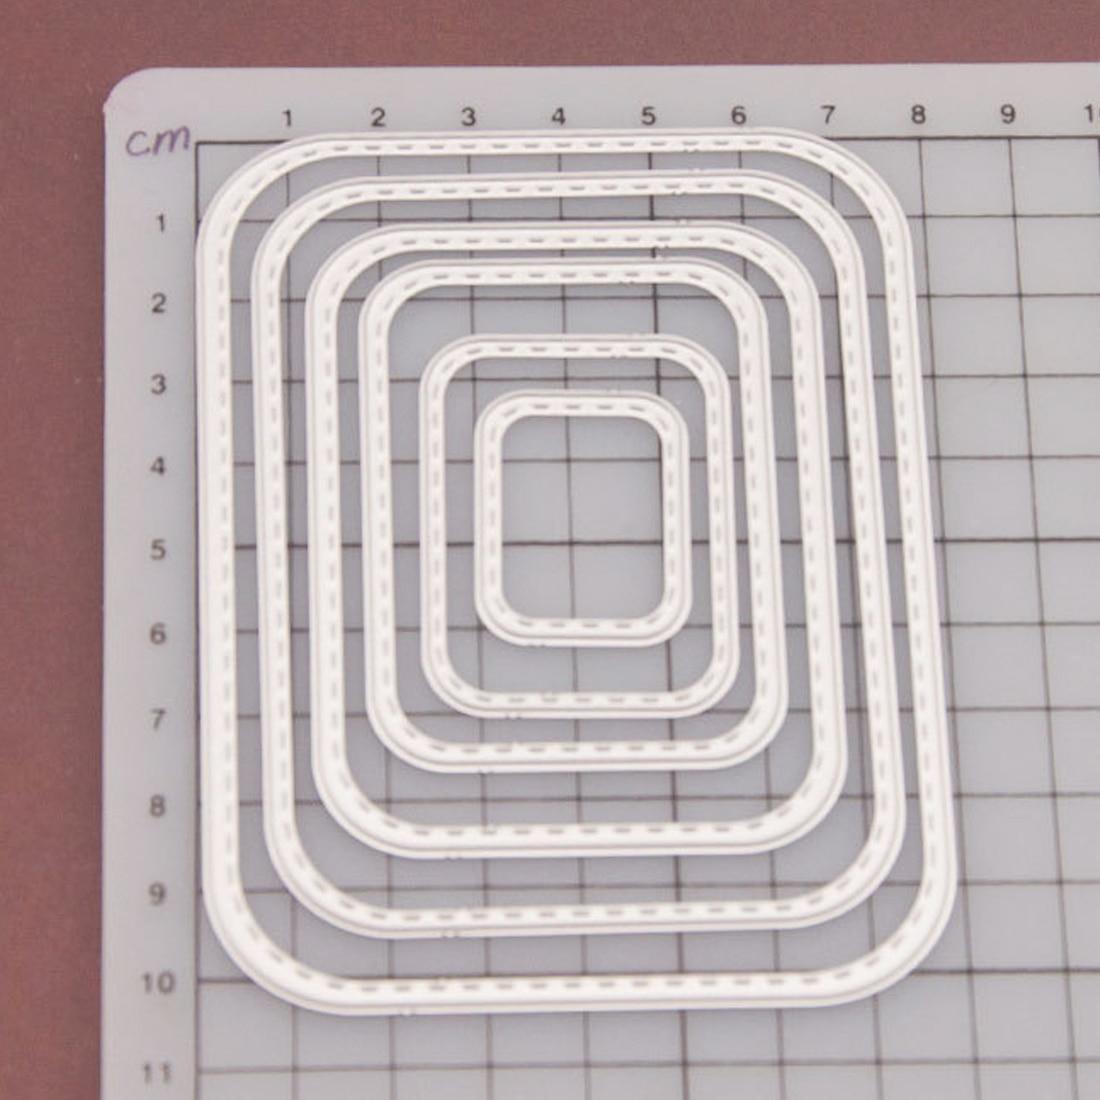 8pcs Scrapbook DIY album Card Paper Card Maker Metal Die cut Stencil sewing